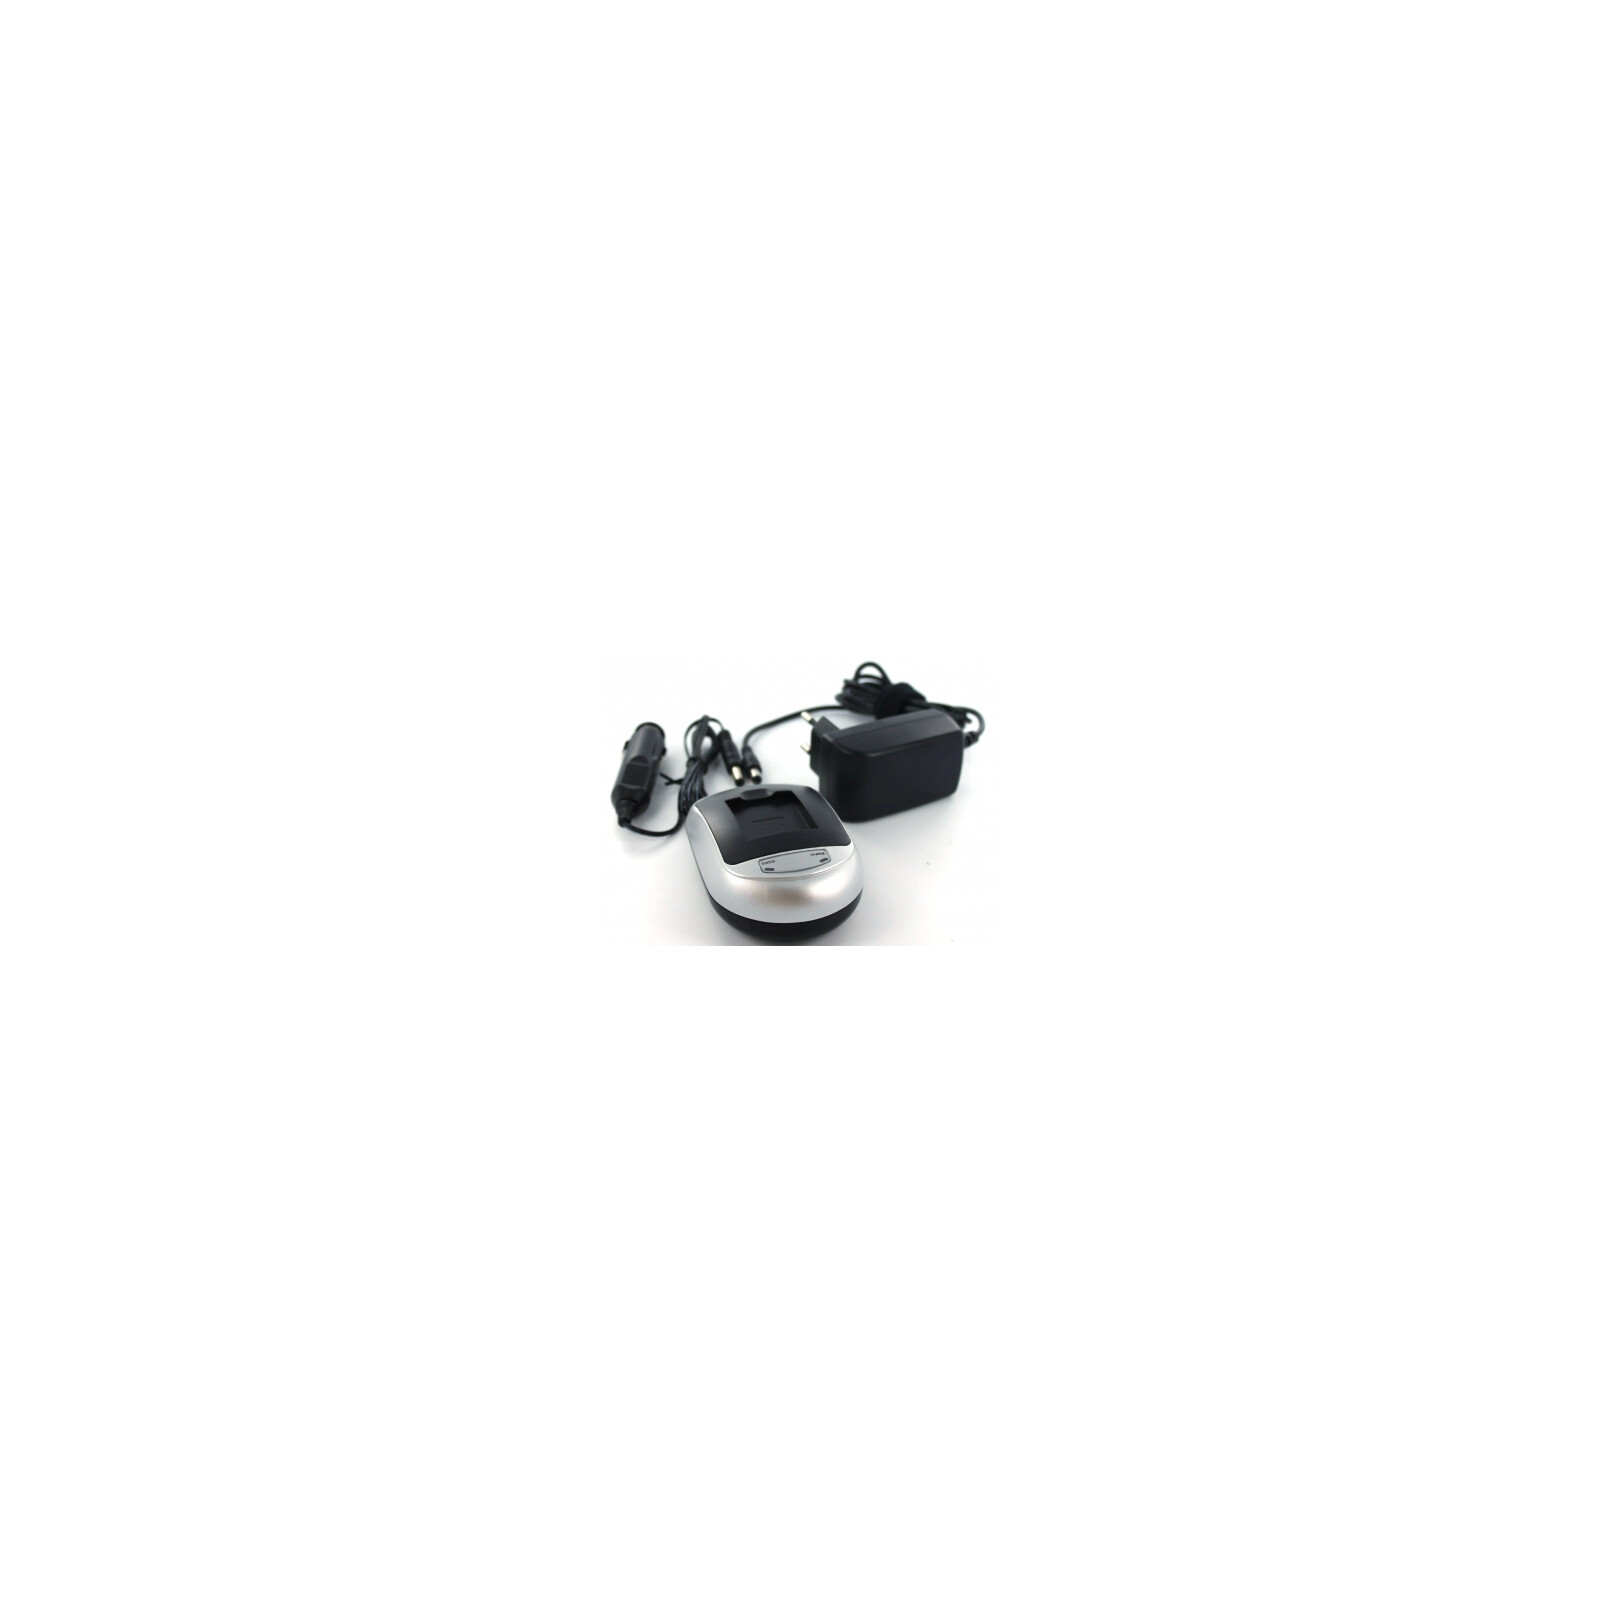 AGI 6882 Ladegerät Nikon Coolpix S5100